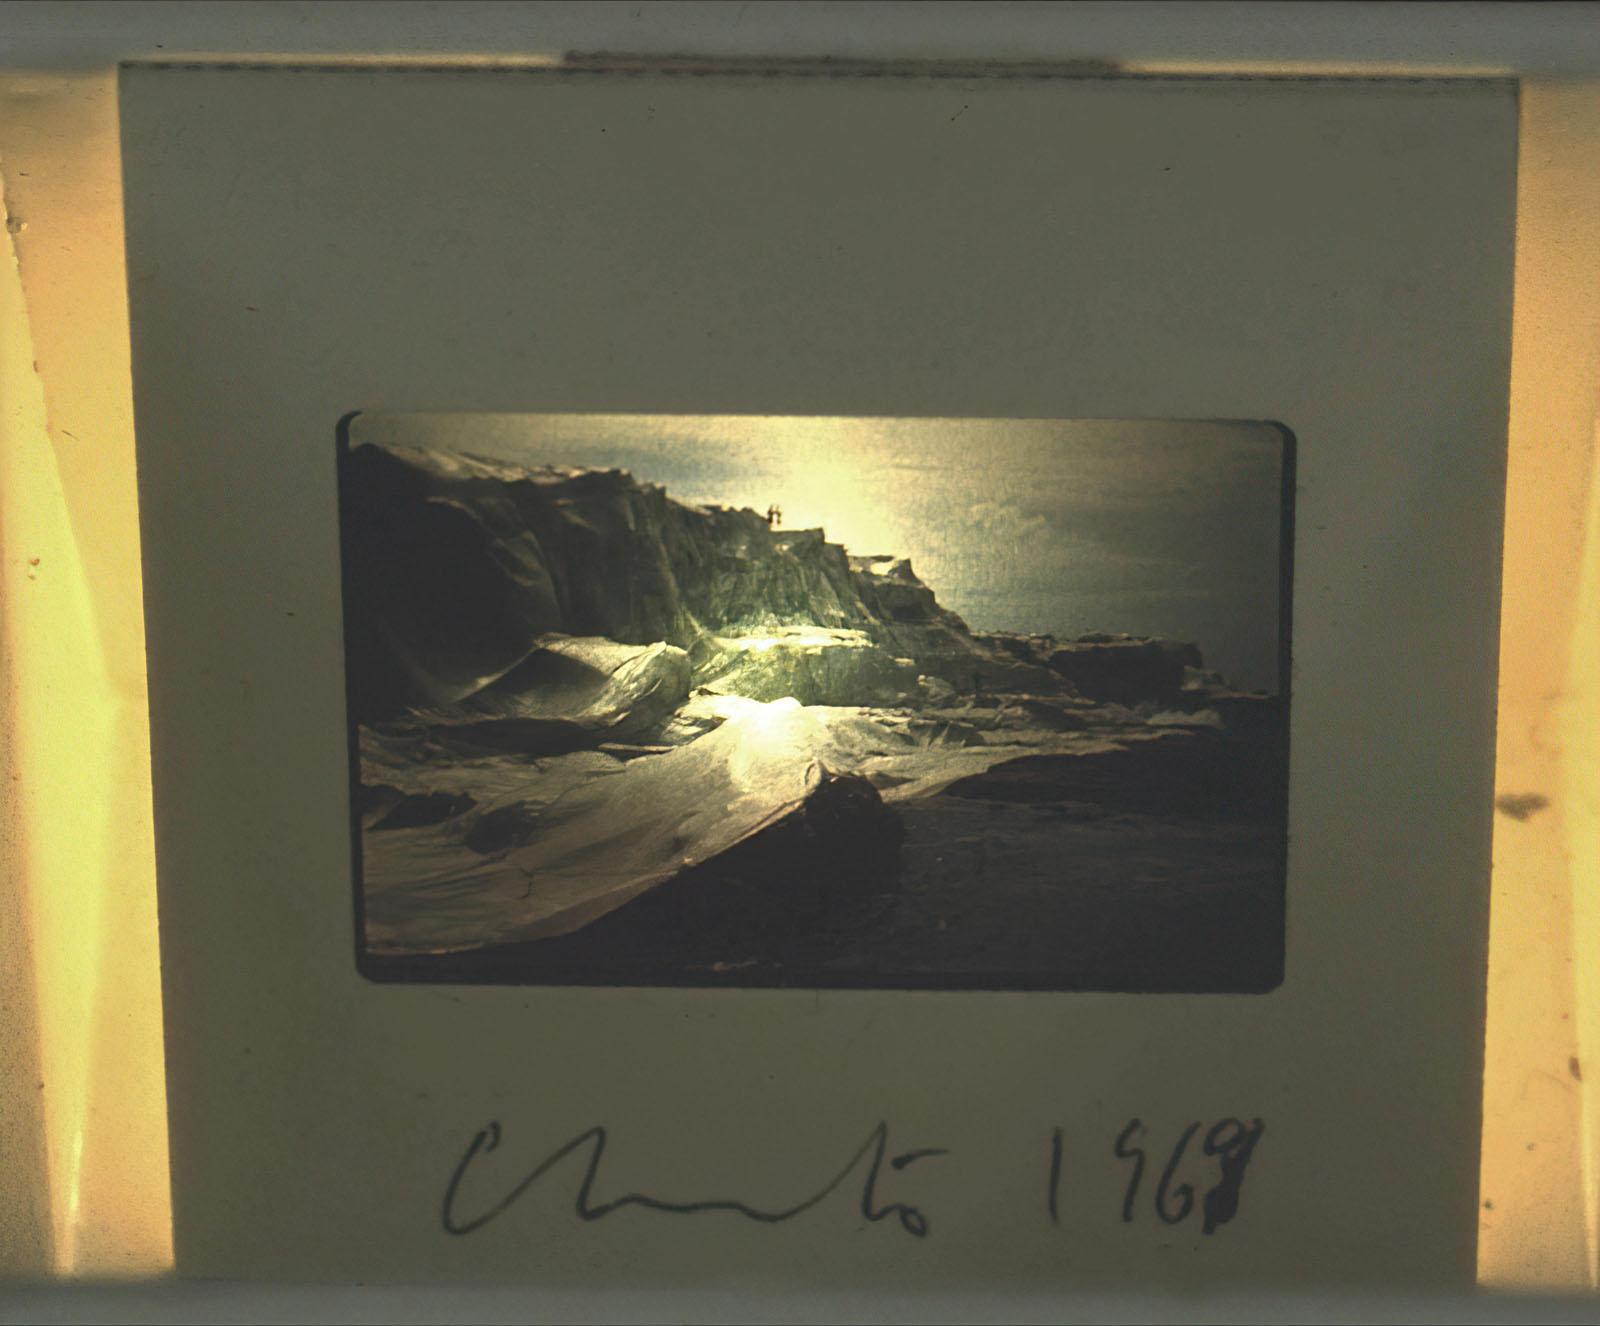 Christo (Javacheff) - Wrapped Coast